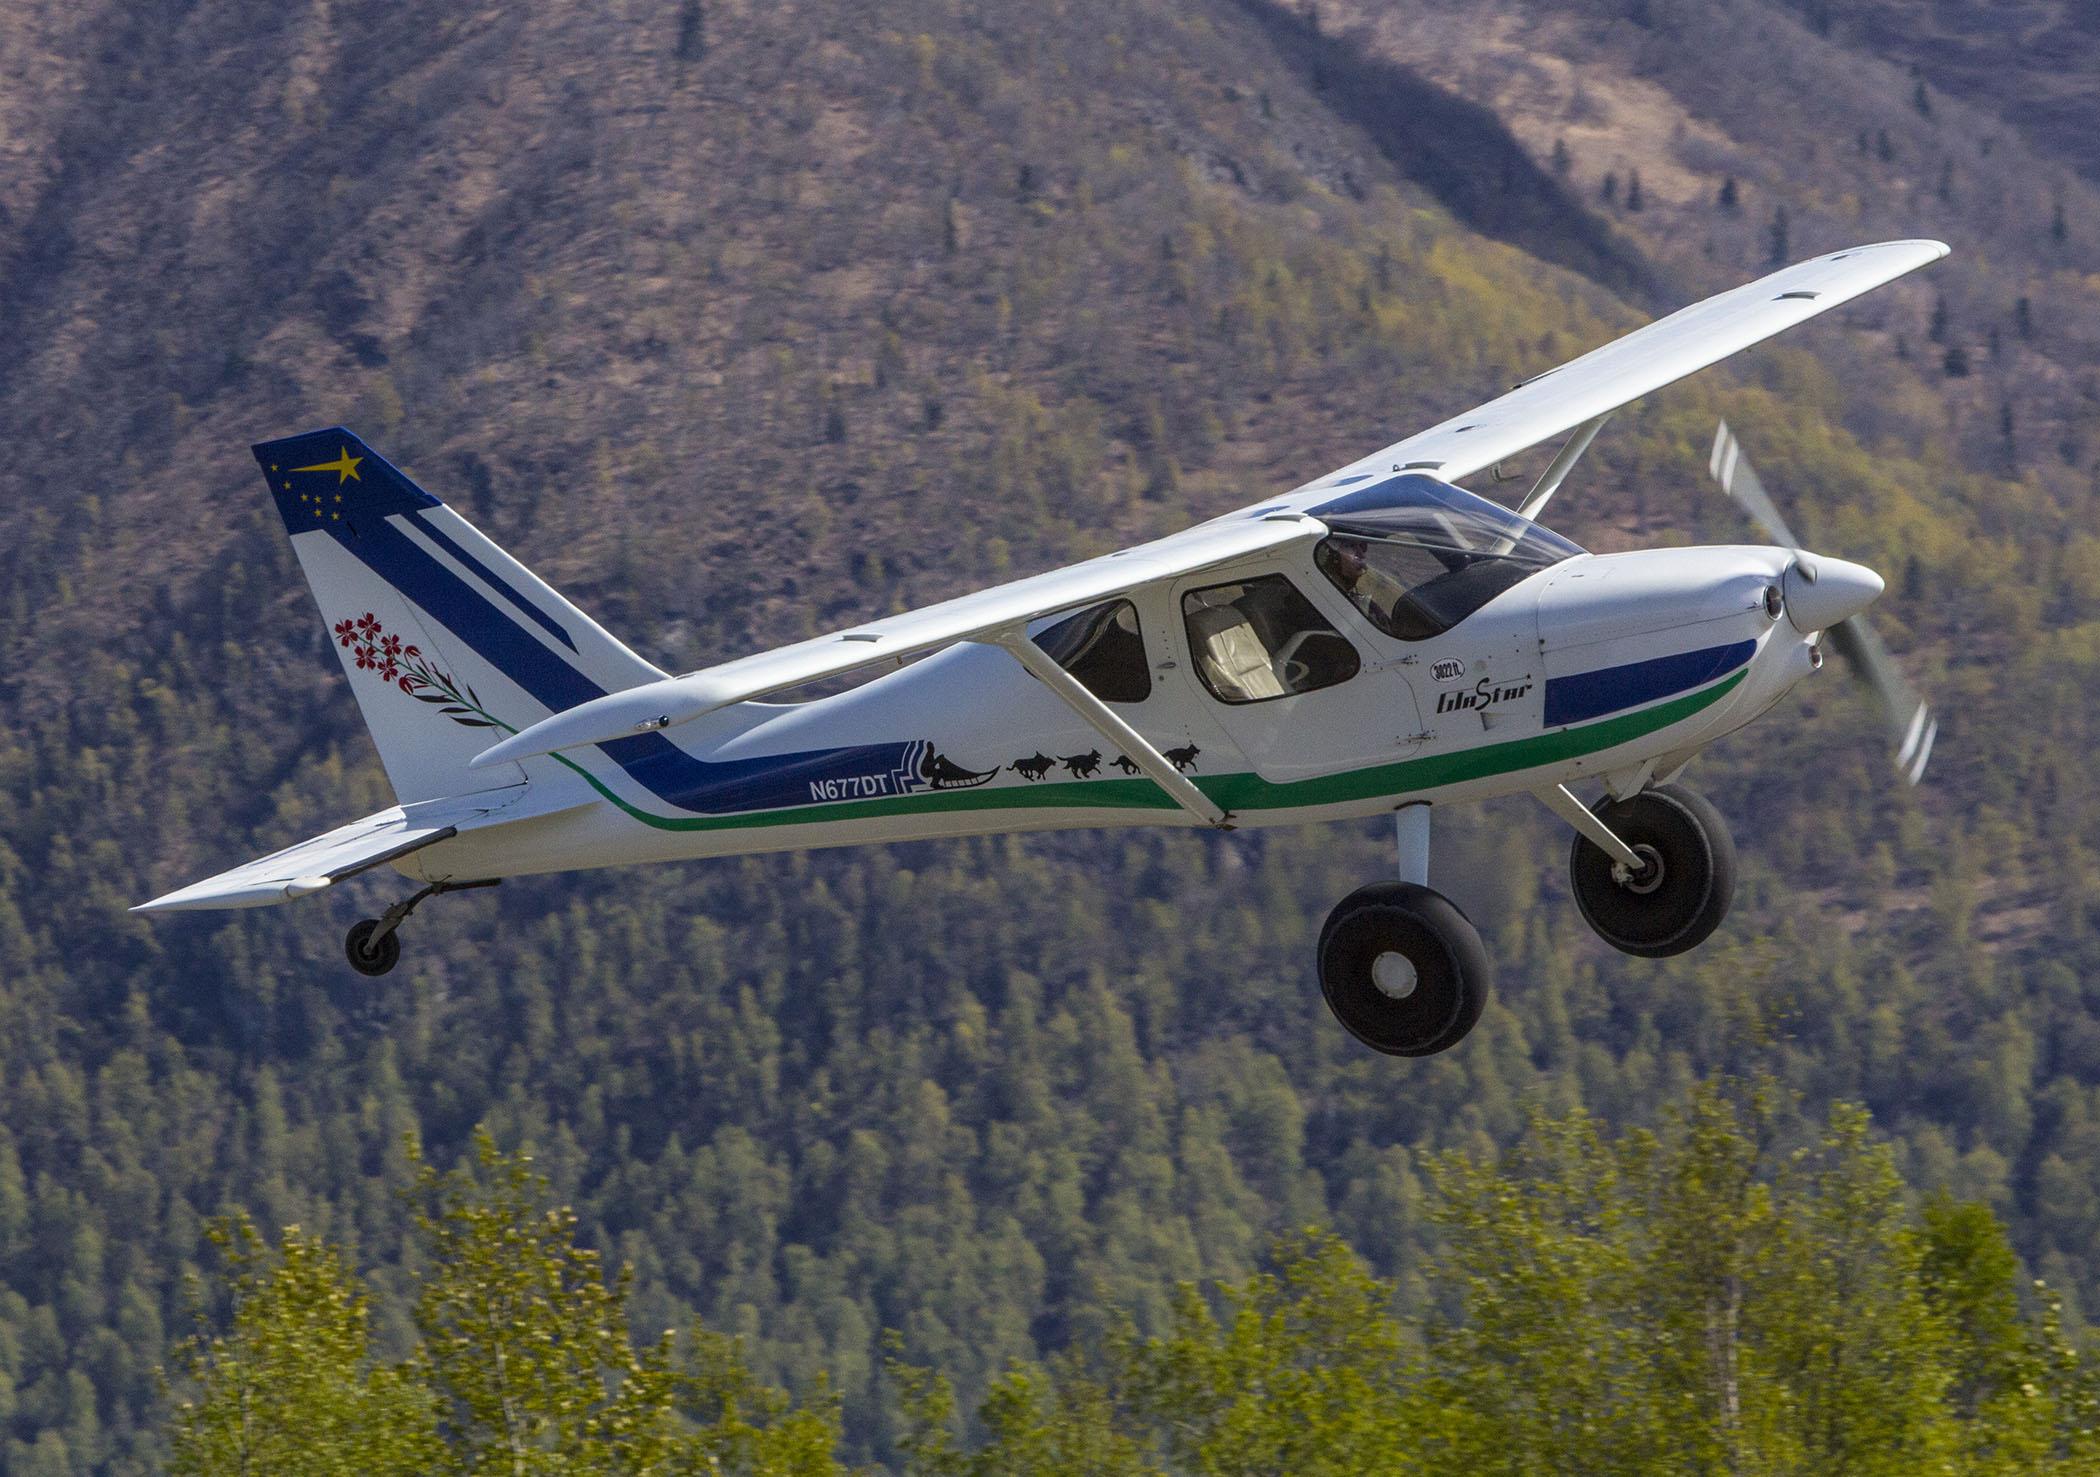 Best Aircraft photography of Alaska  Alaskafoto - Aircraft portraits, Alaska photography